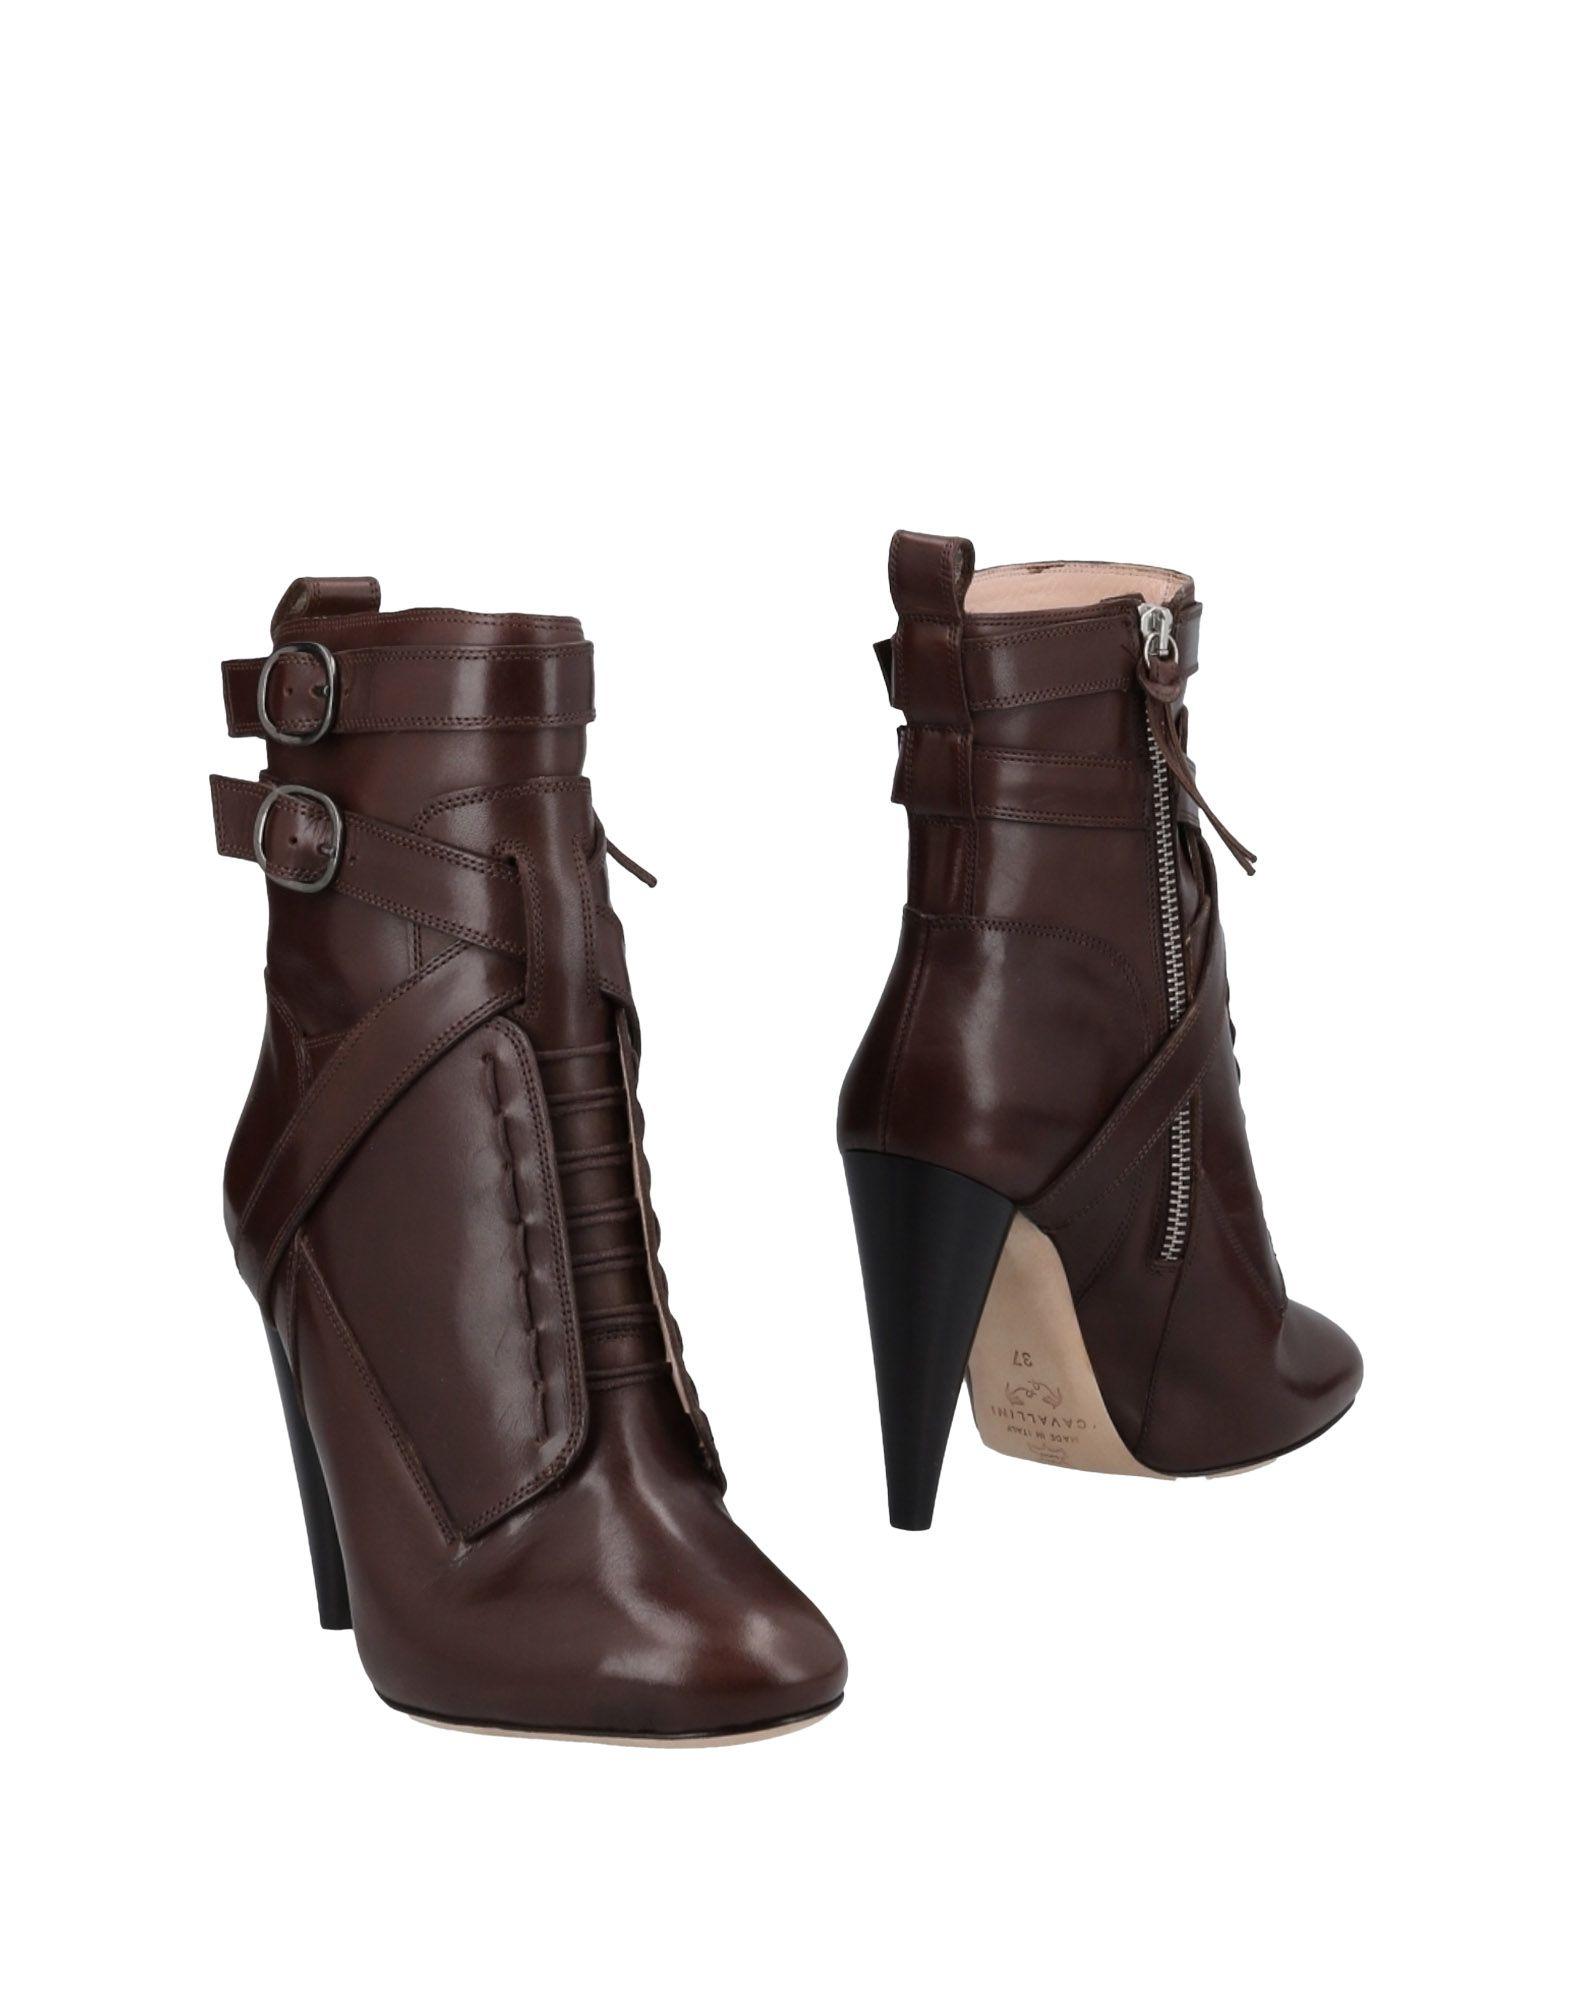 Cavallini Stiefelette strapazierfähige Damen  11483654MTGut aussehende strapazierfähige Stiefelette Schuhe ff6198